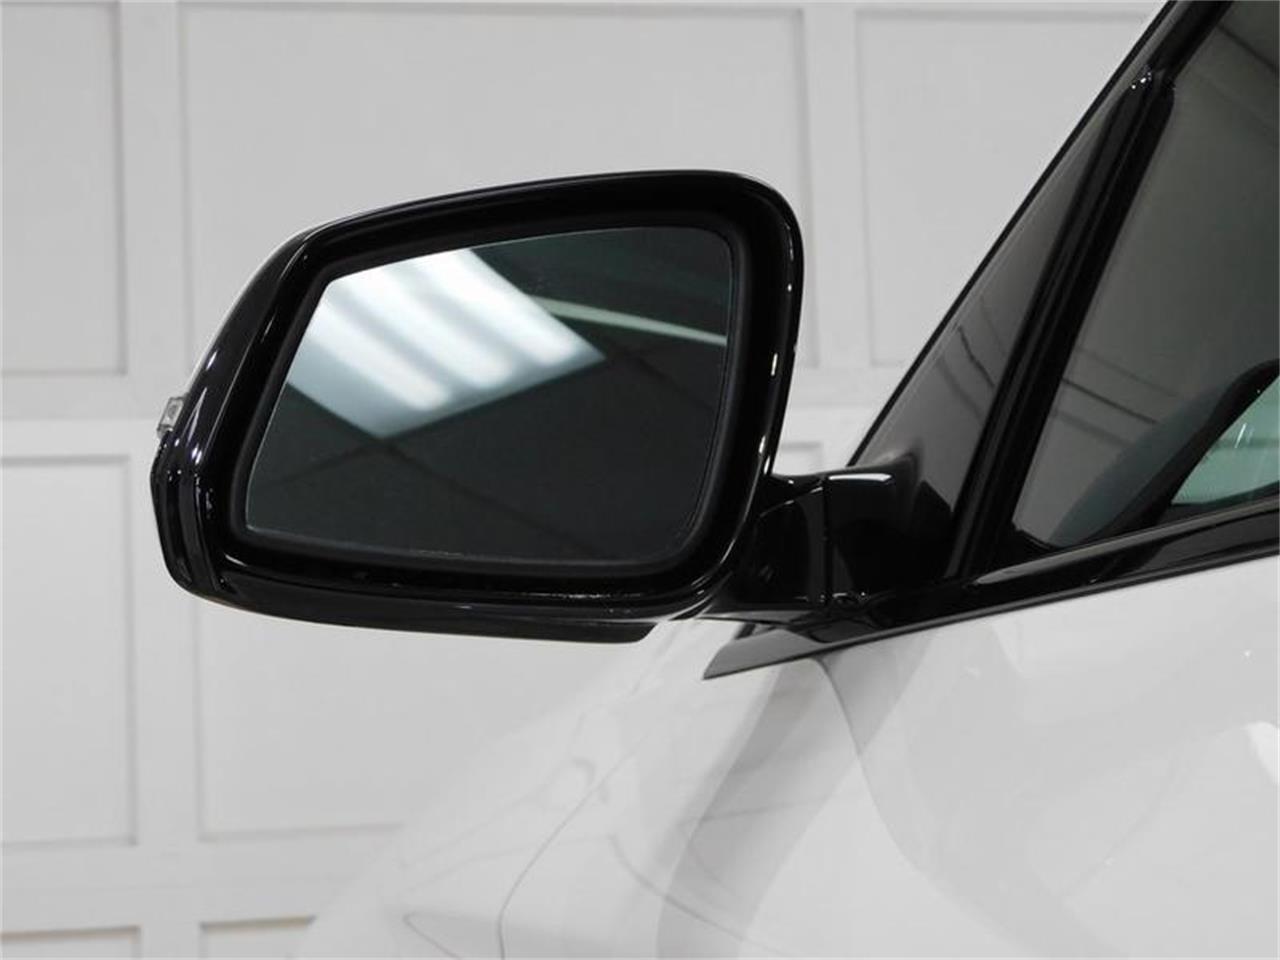 2016 BMW 5 Series (CC-1275905) for sale in Hamburg, New York